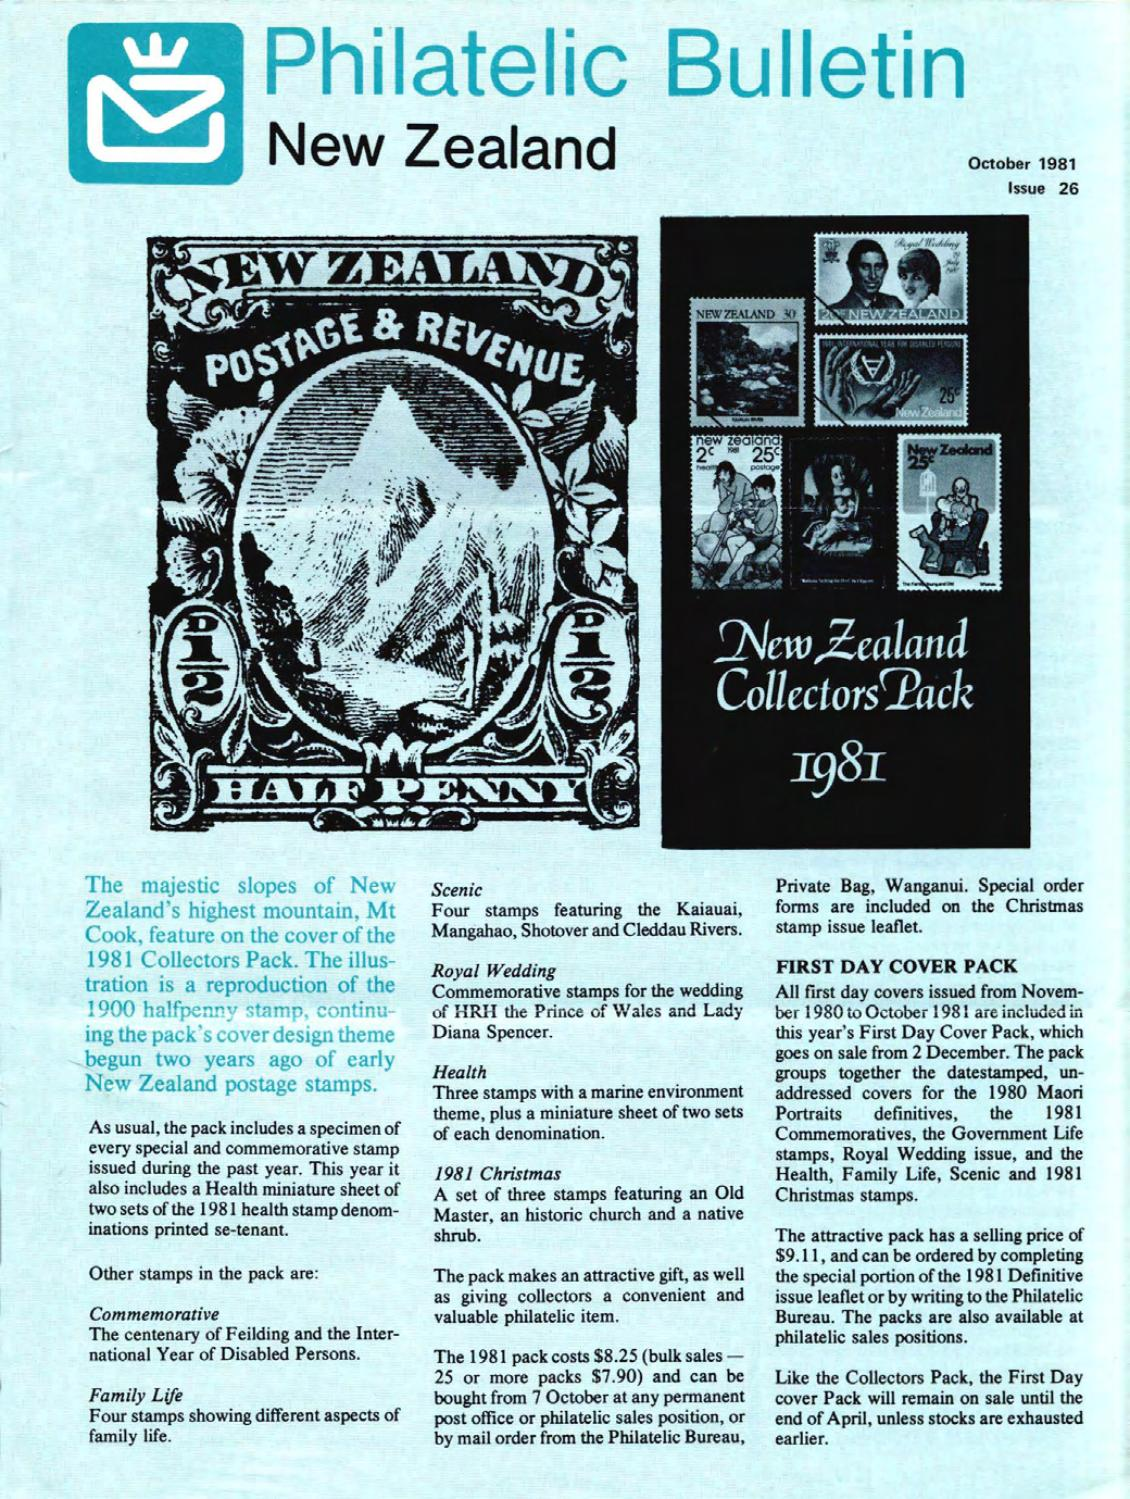 Series 4 new zealand philatelic bulletin no 26 1981 october